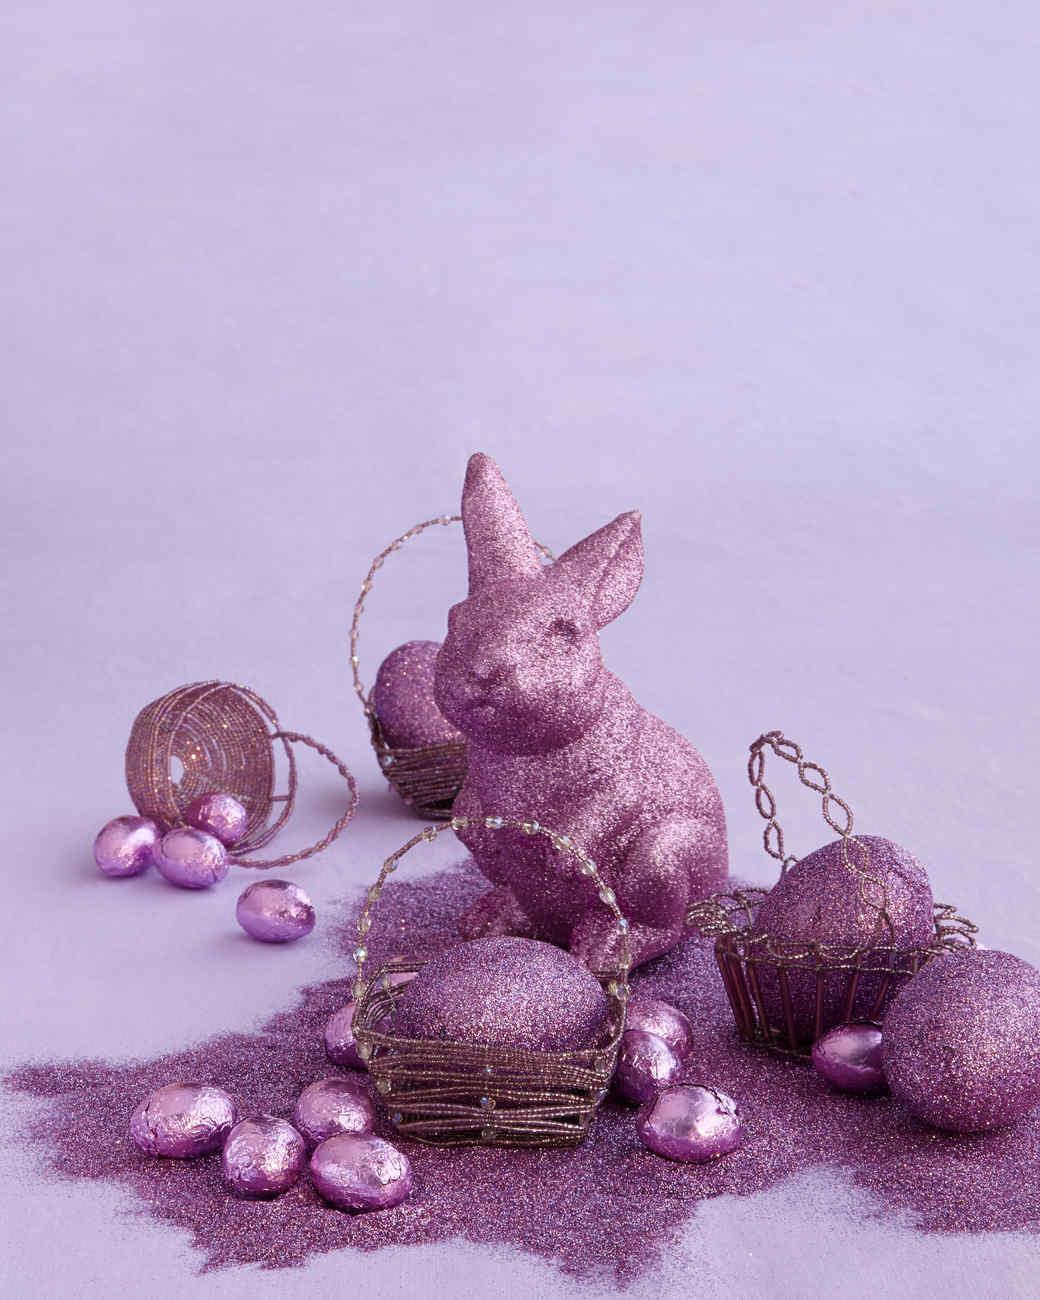 easter-centerpiece-purple-1880-d111156-0414-comp.jpg